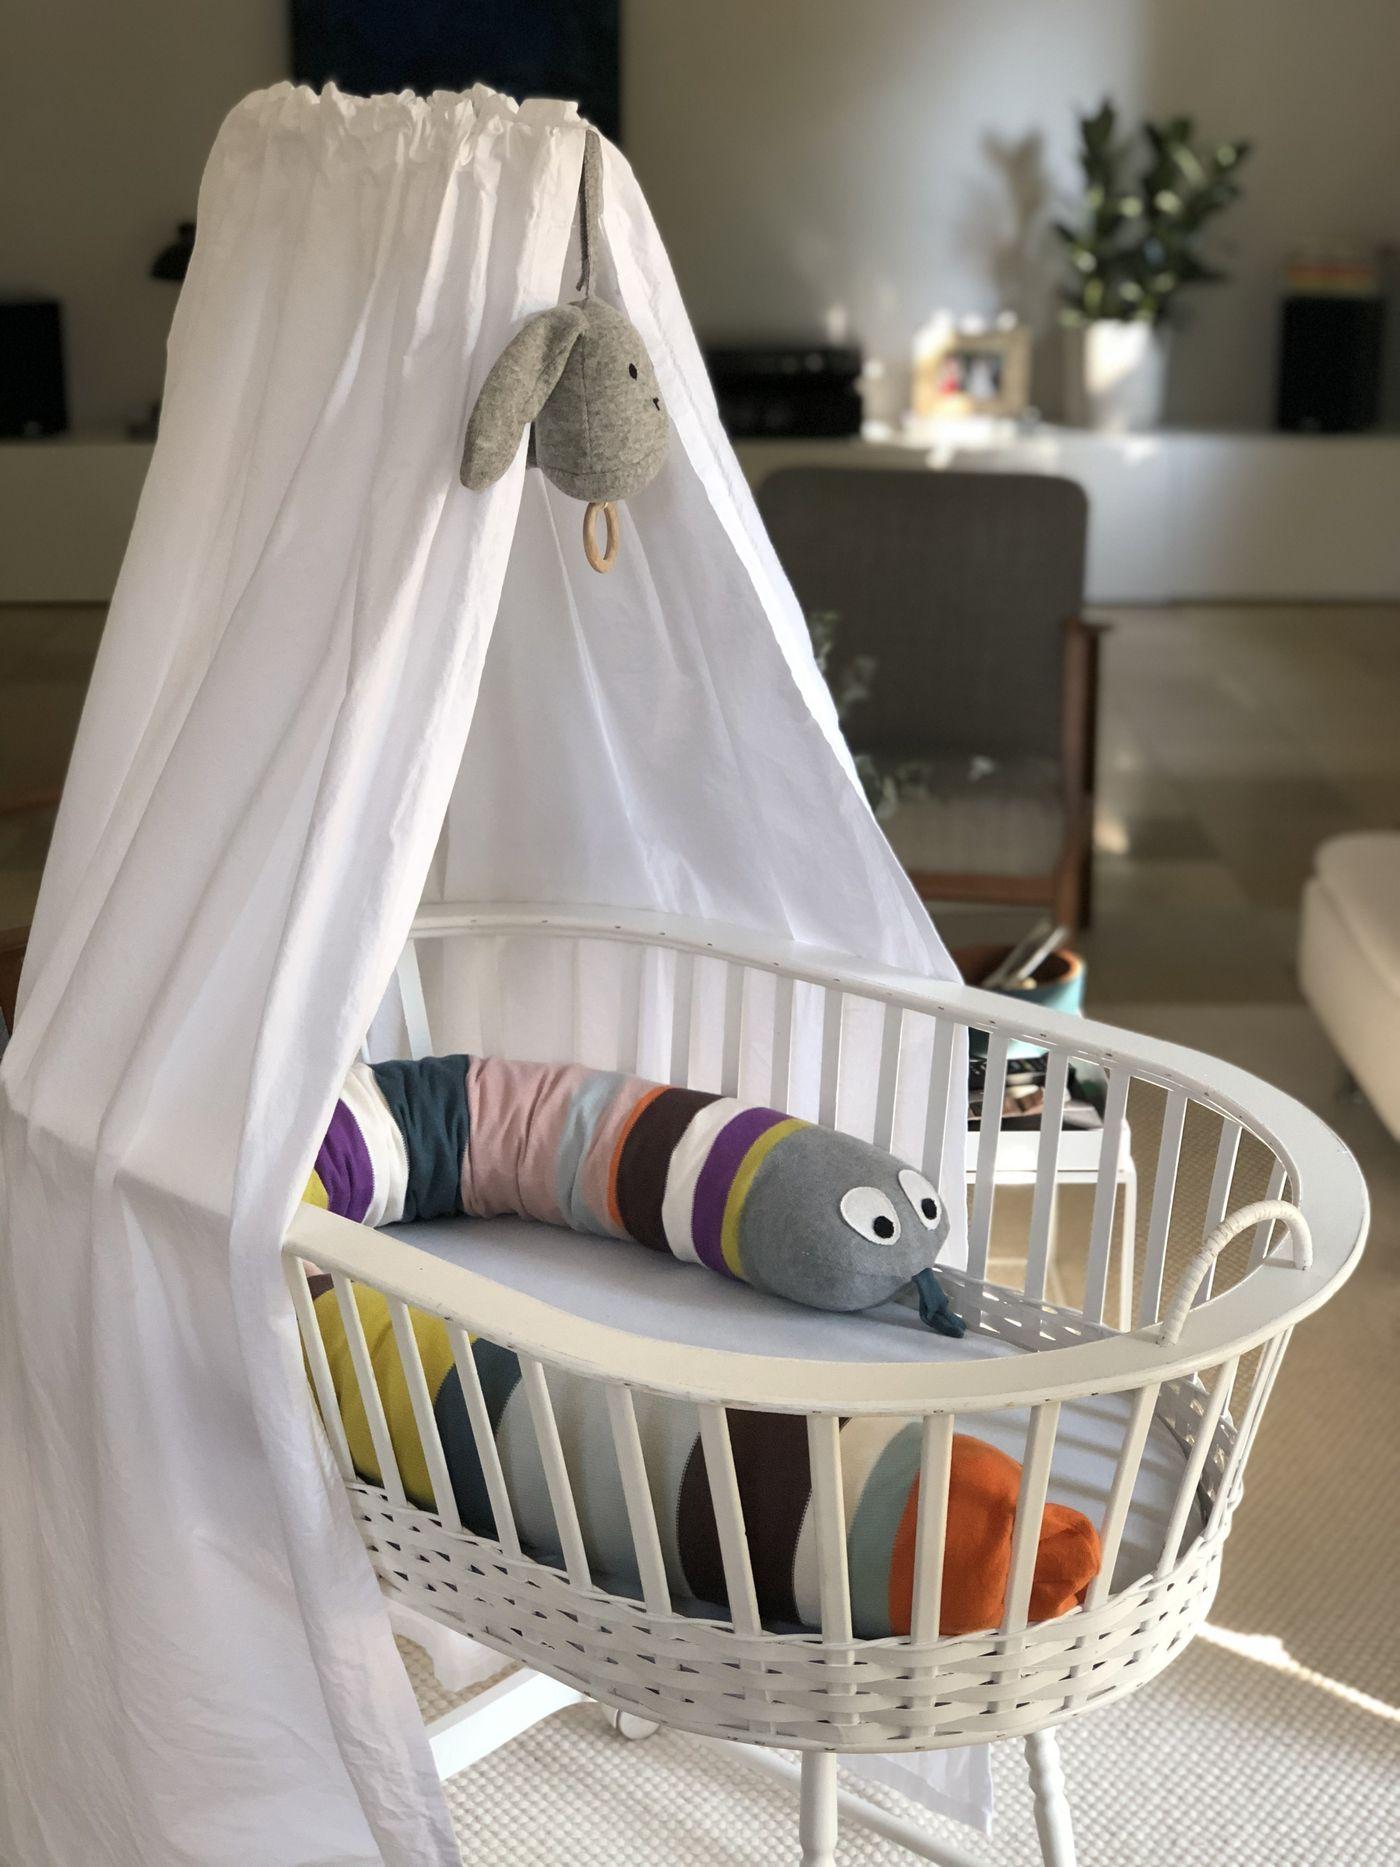 stubenwagen bilder ideen. Black Bedroom Furniture Sets. Home Design Ideas